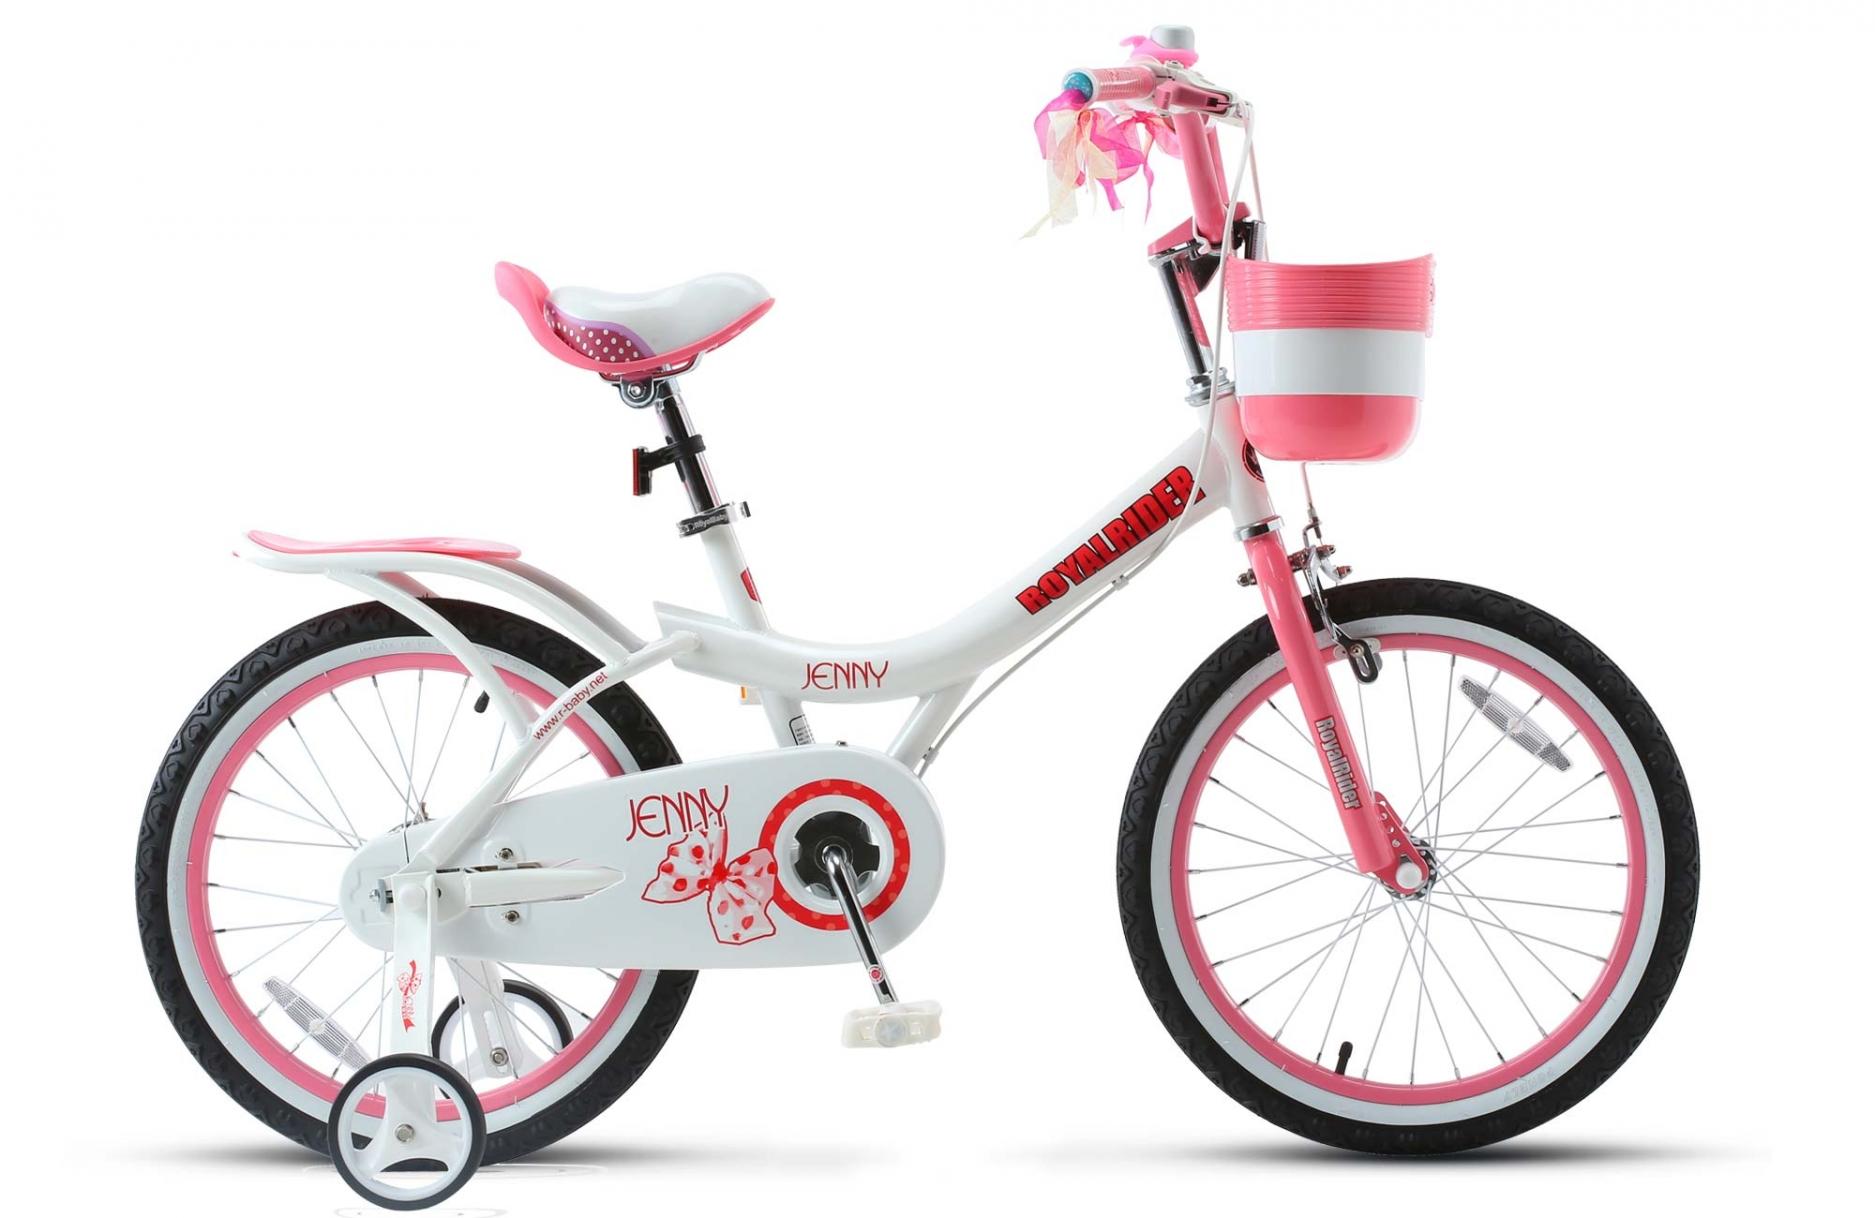 Велосипед Royal Baby Jenny Girl Steel 16 бело-розовый one size